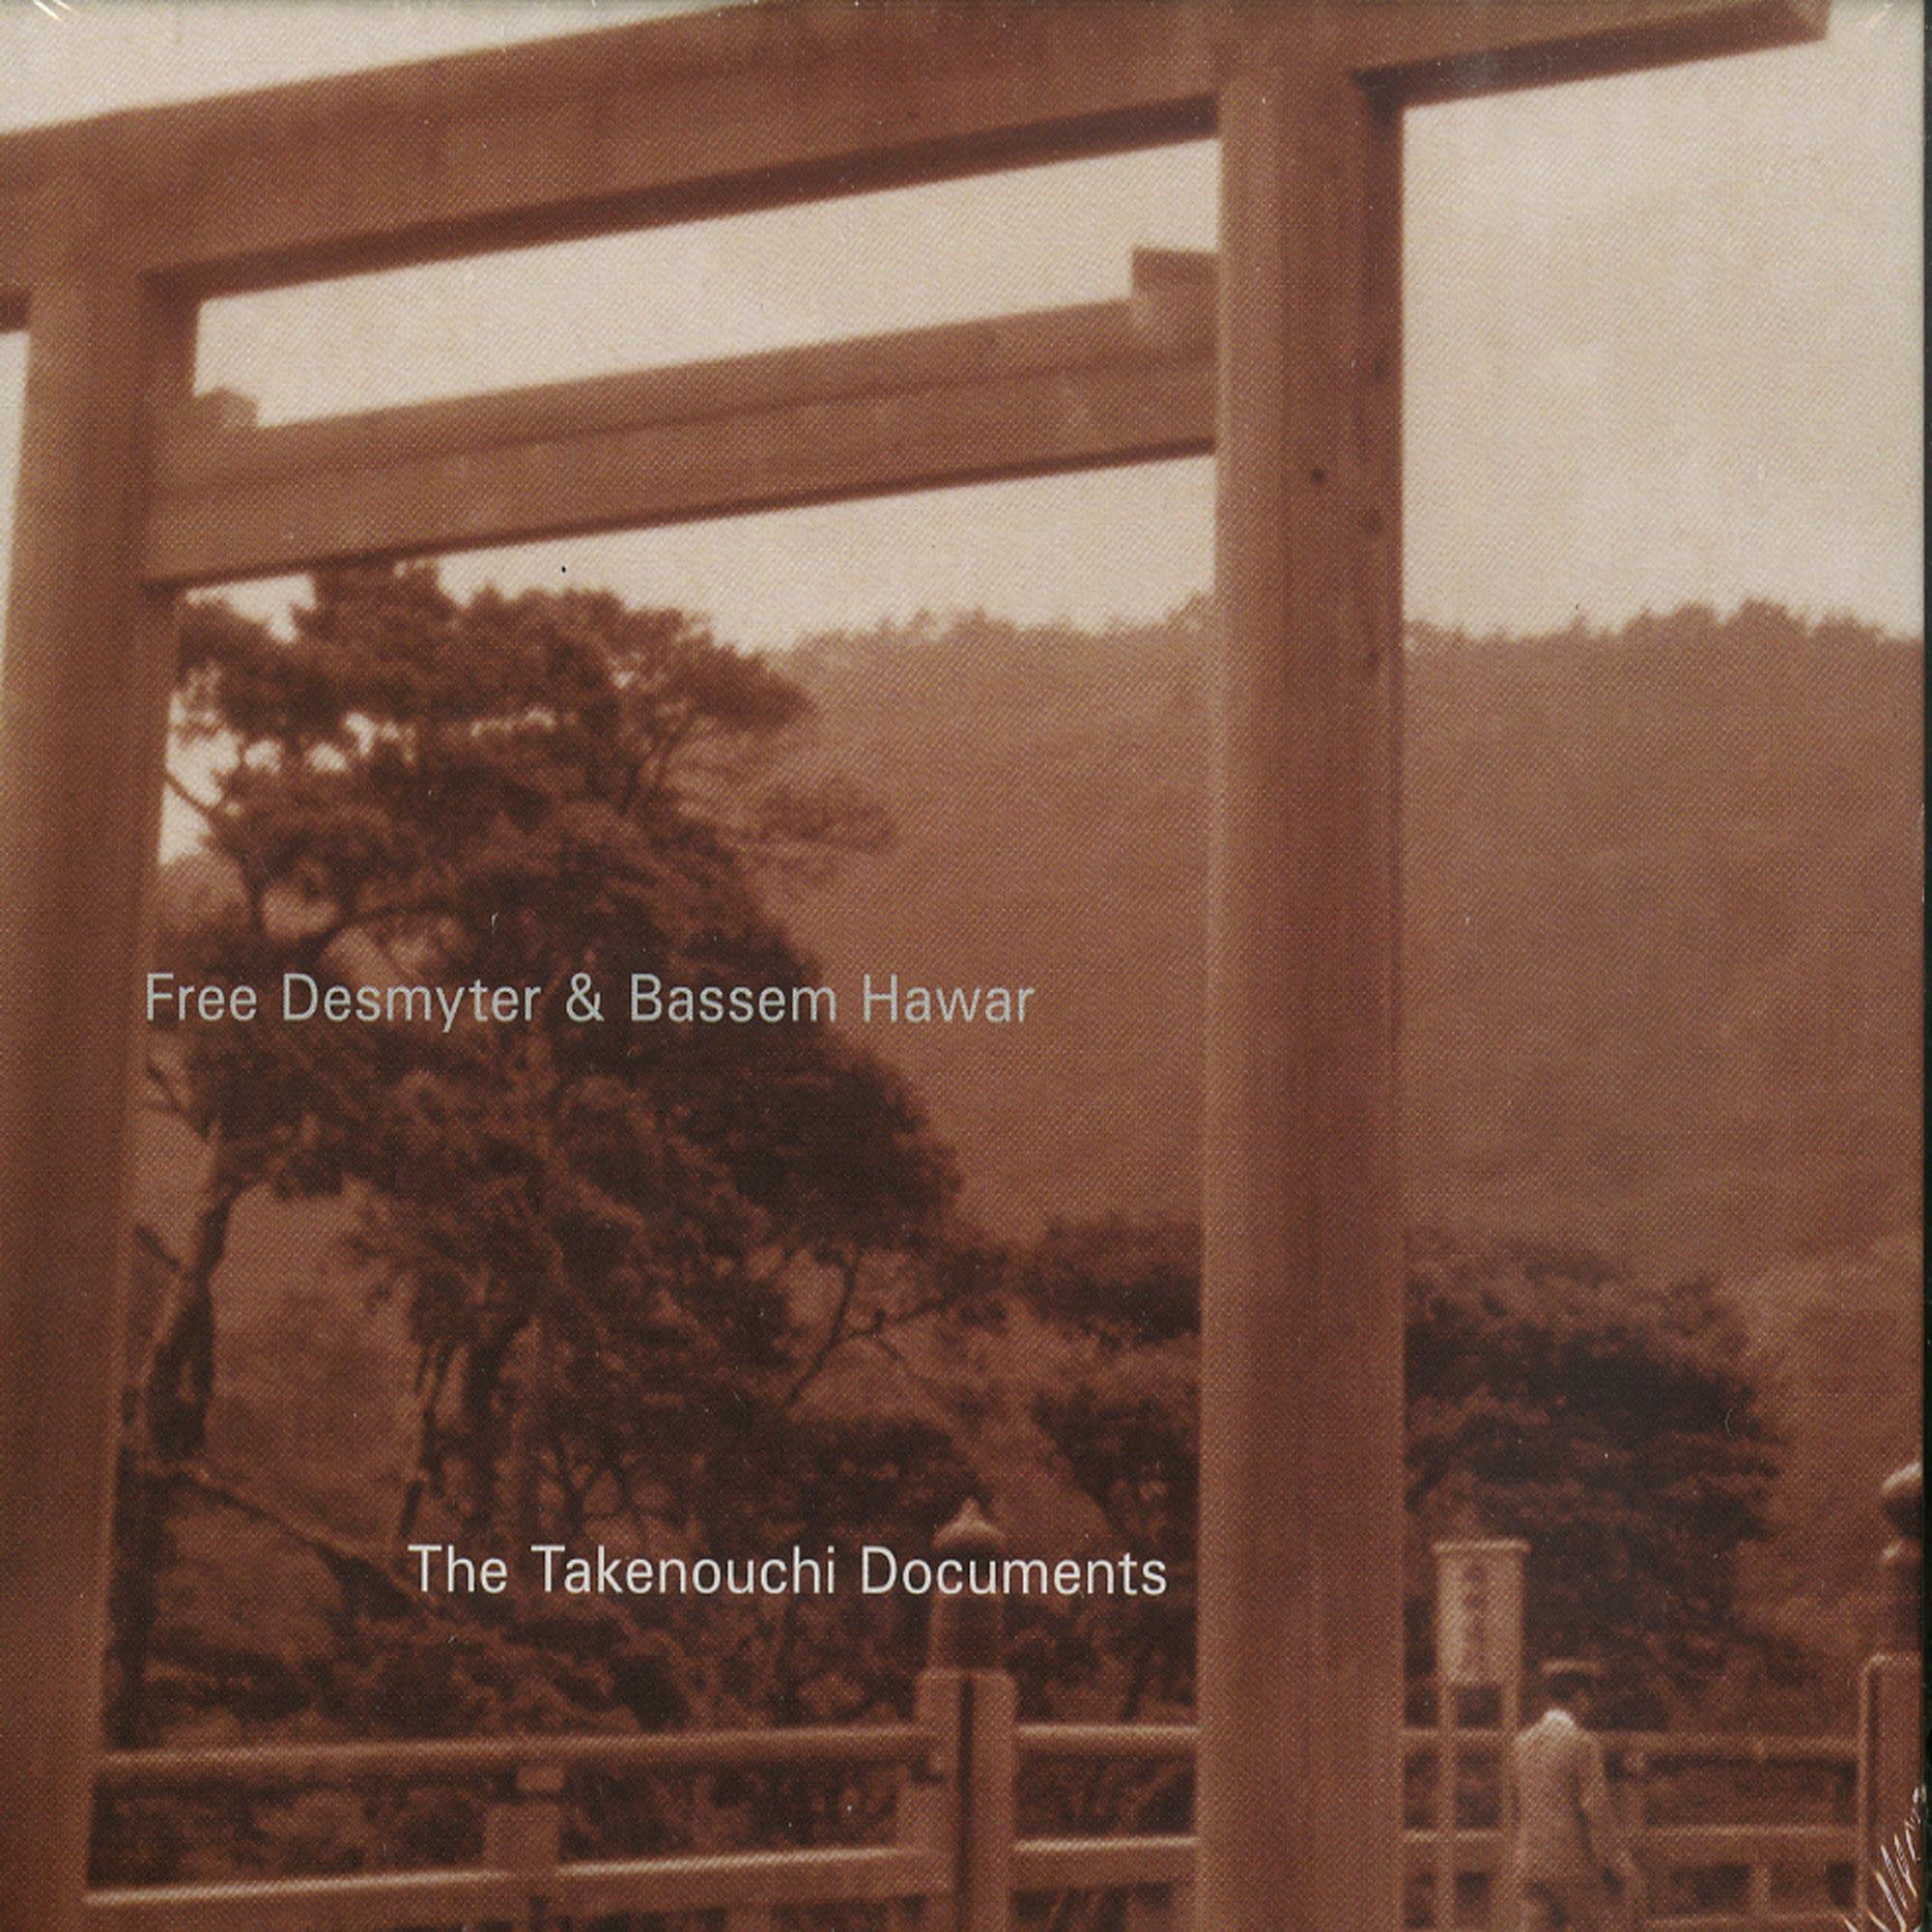 Free Desmyter & Bassem Hawar - THE TAKENOUCHI DOCUMENTS